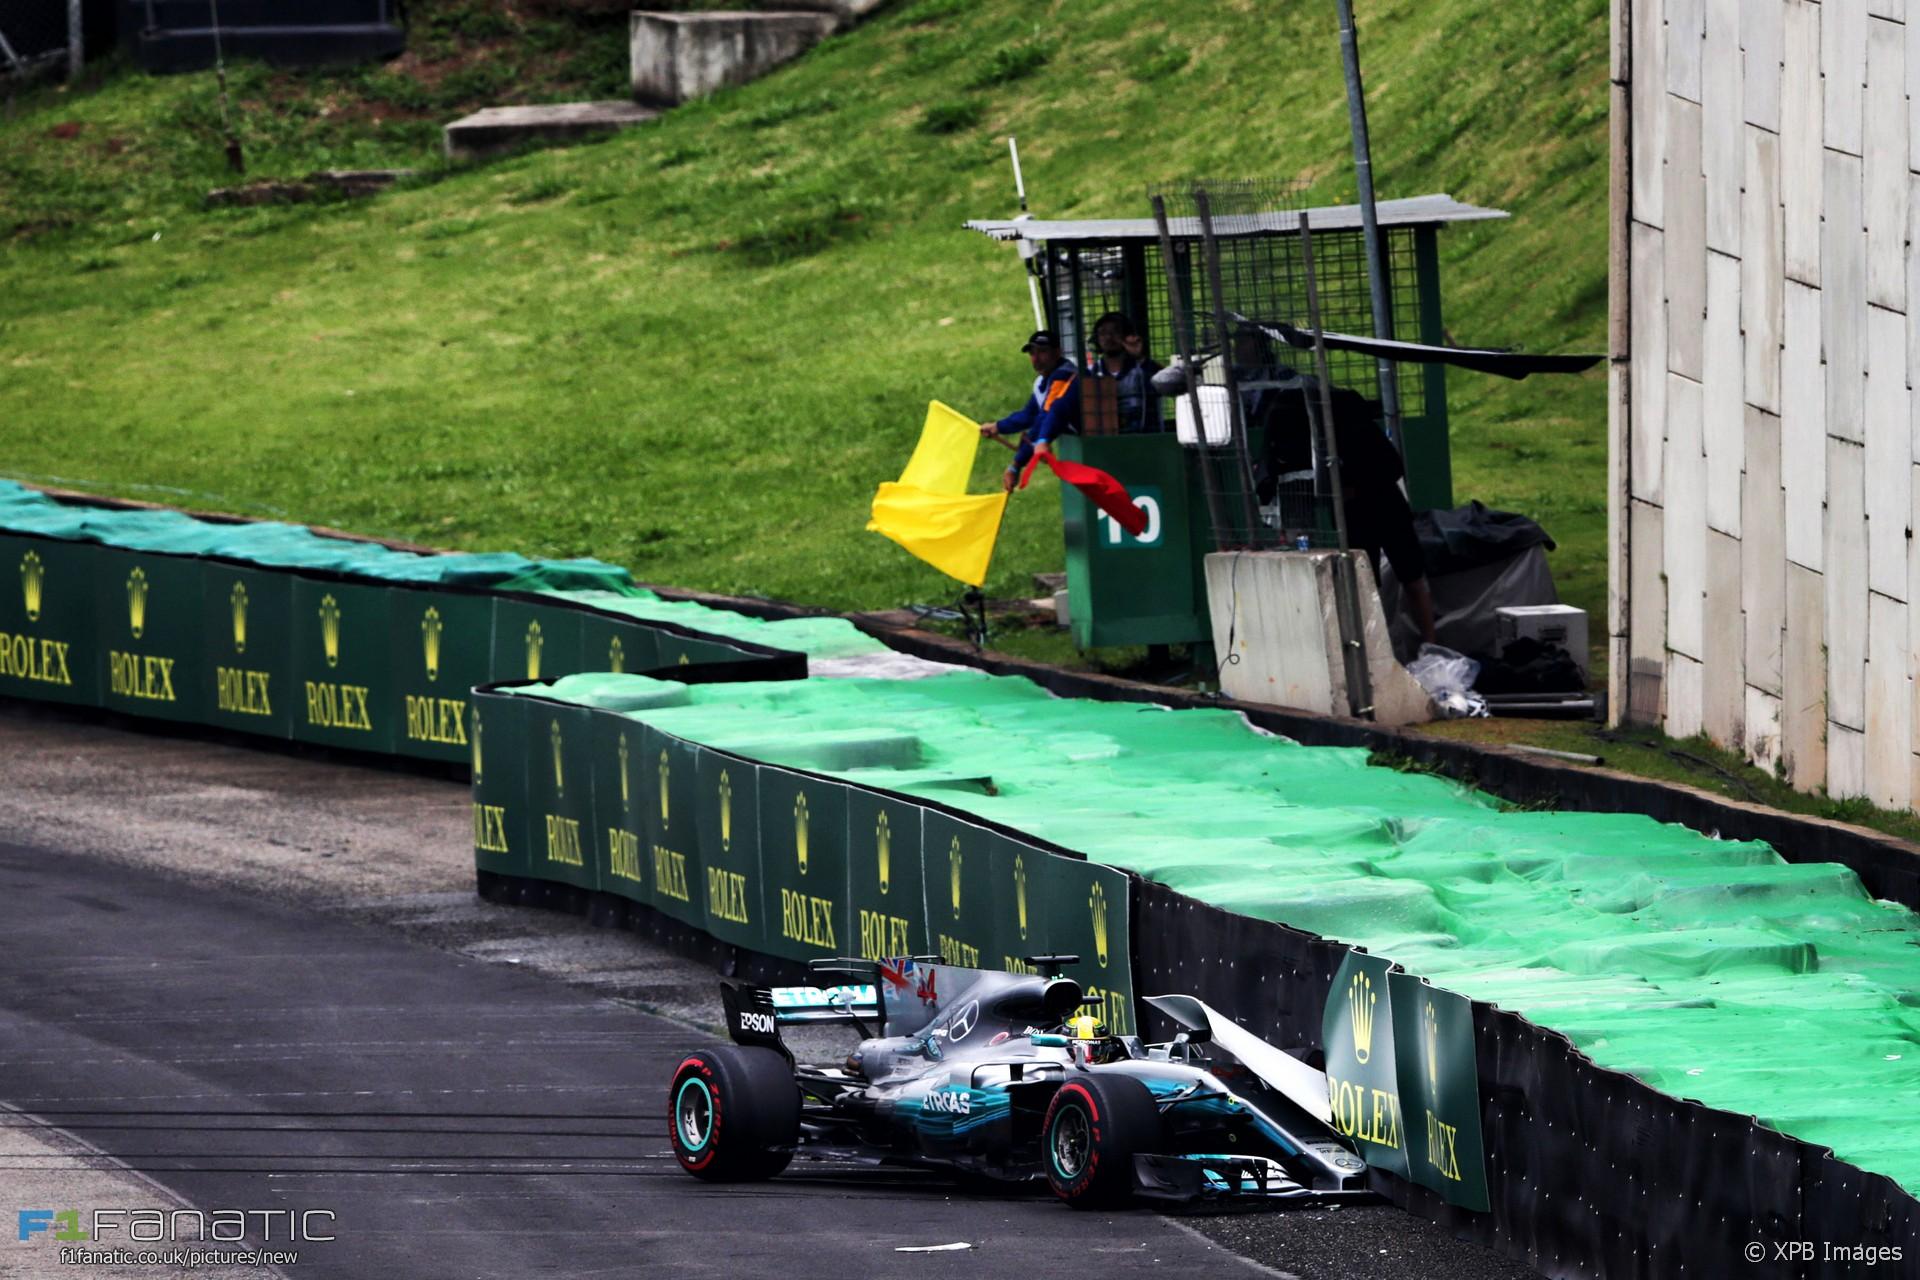 Lewis Hamilton, Mercedes, Interlagos, 2017